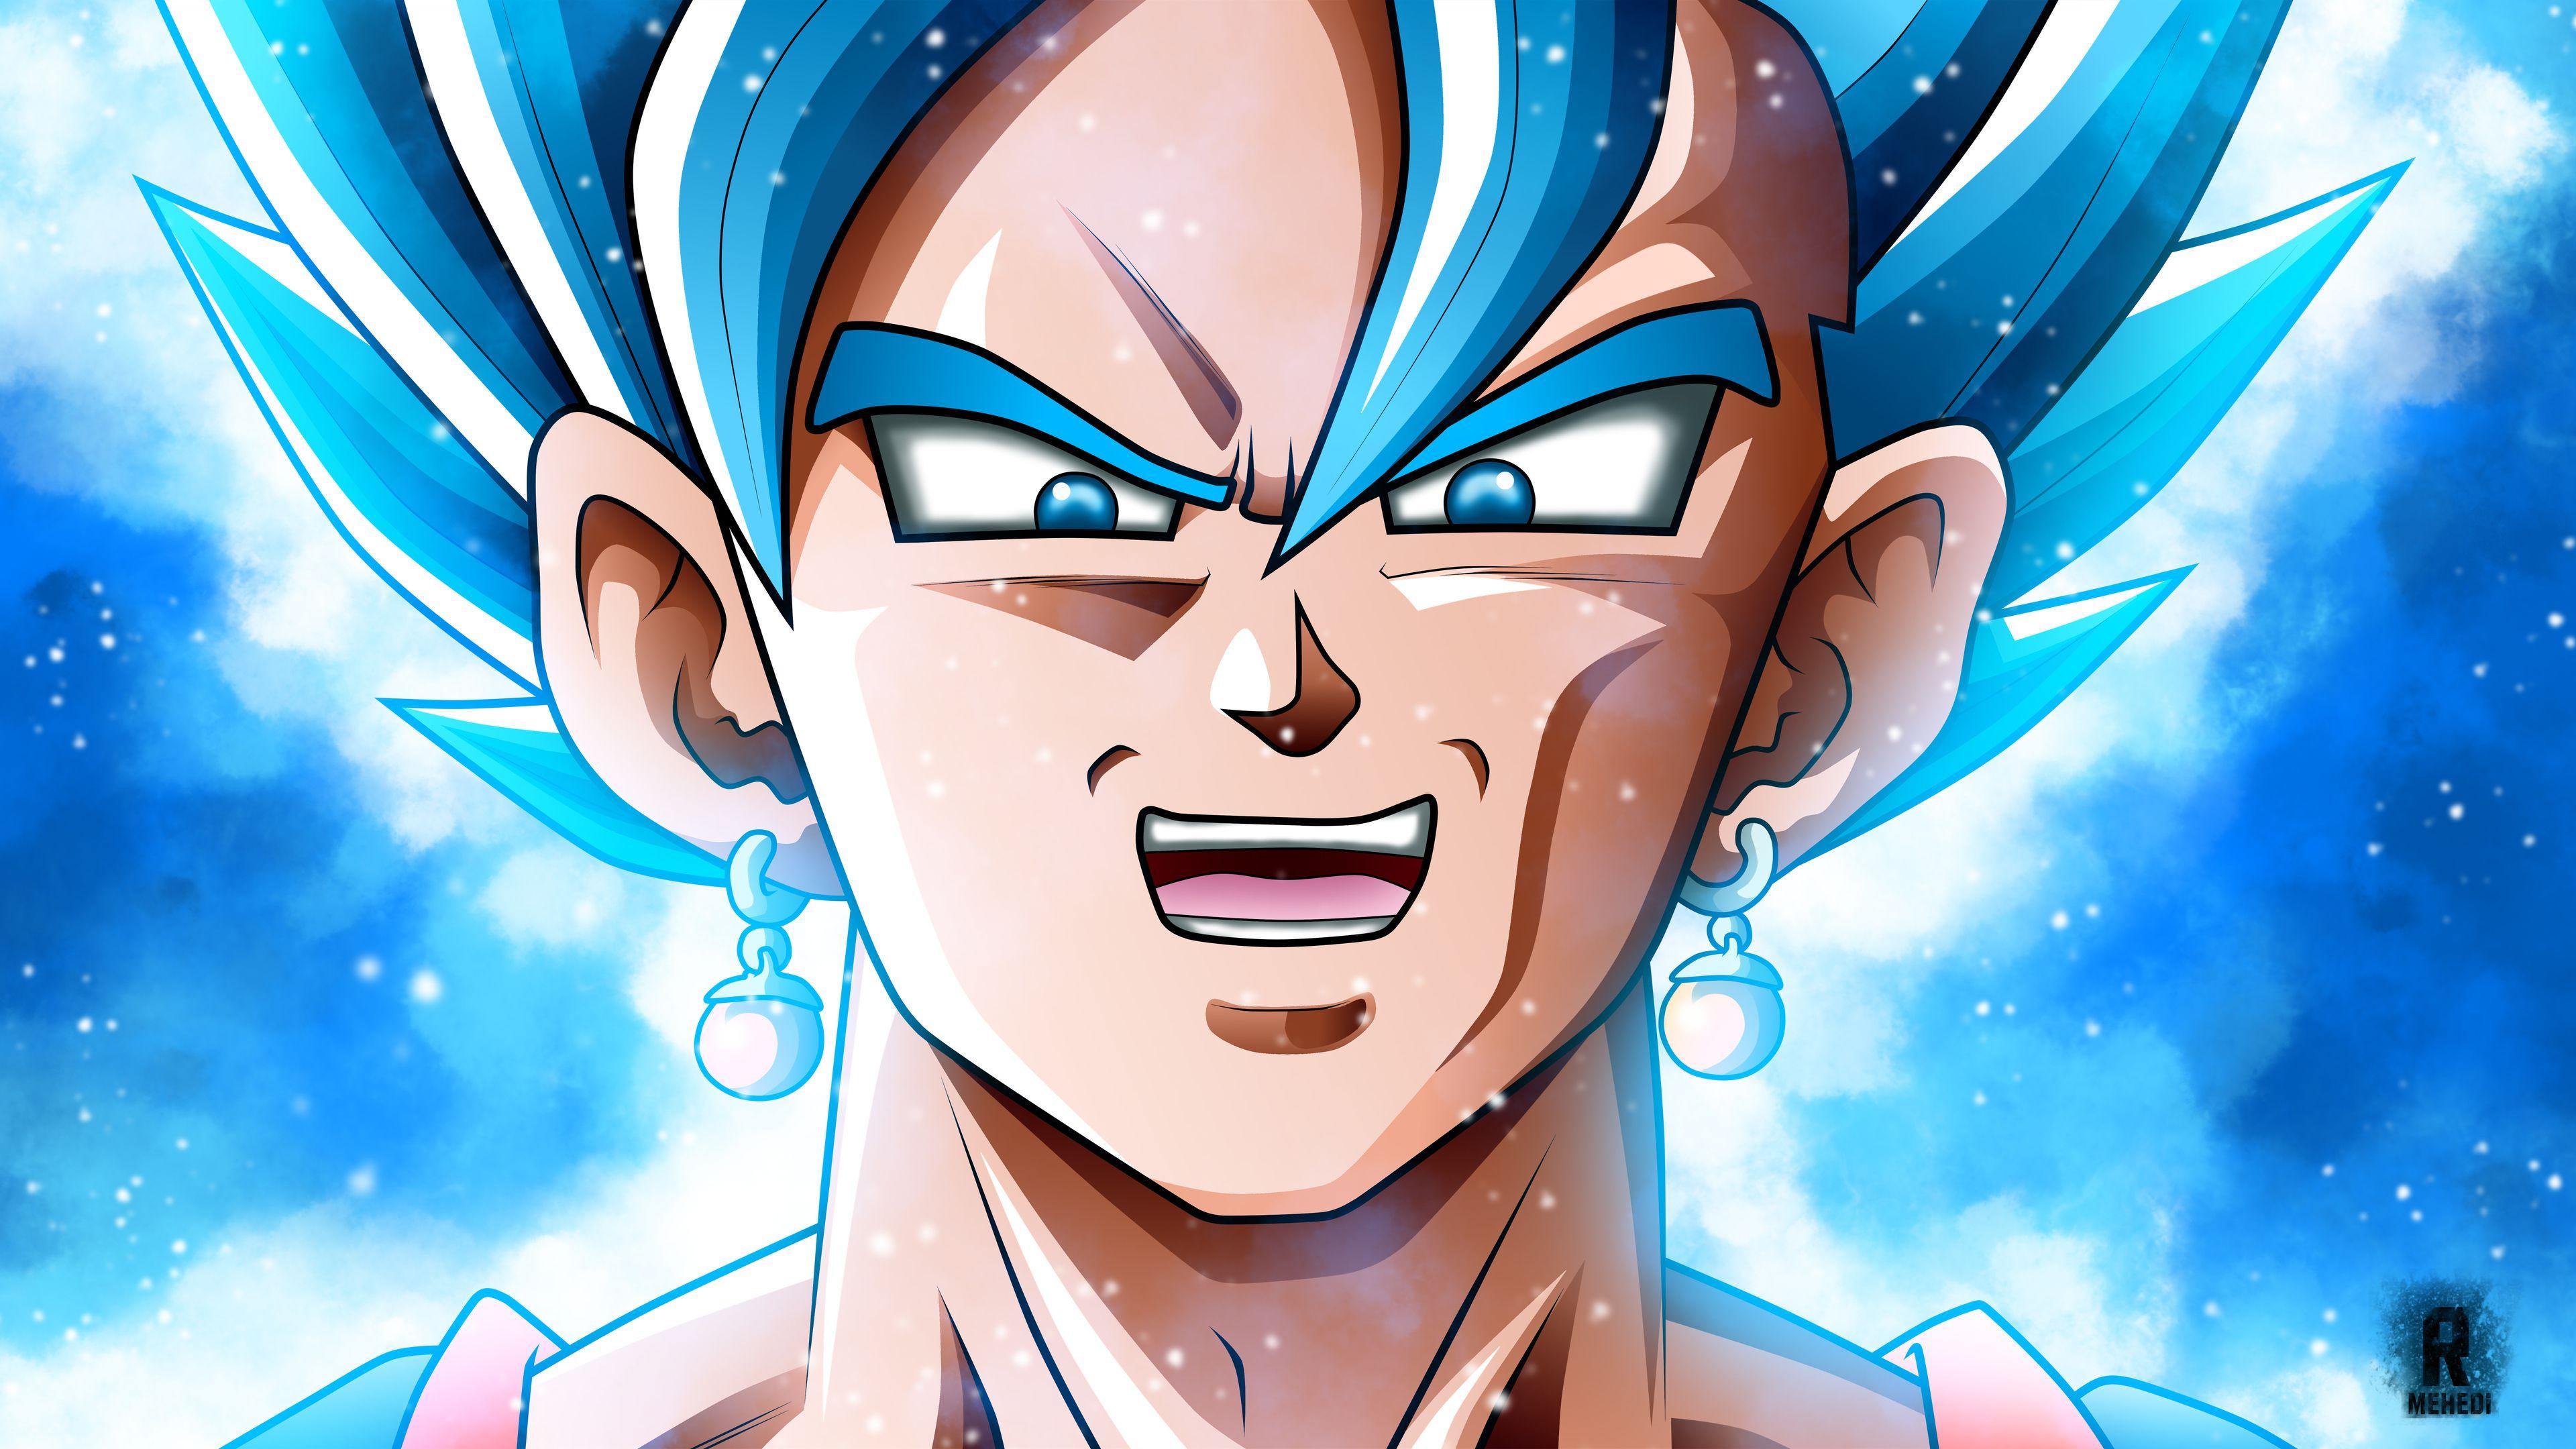 Dragon Ball Super Saiyajin Blue Hd Wallpapers Goku Wallpapers Dragon Ball Wallpapers Dragon Ball Super Wal In 2020 Dragon Ball Super Wallpapers Anime Goku Wallpaper